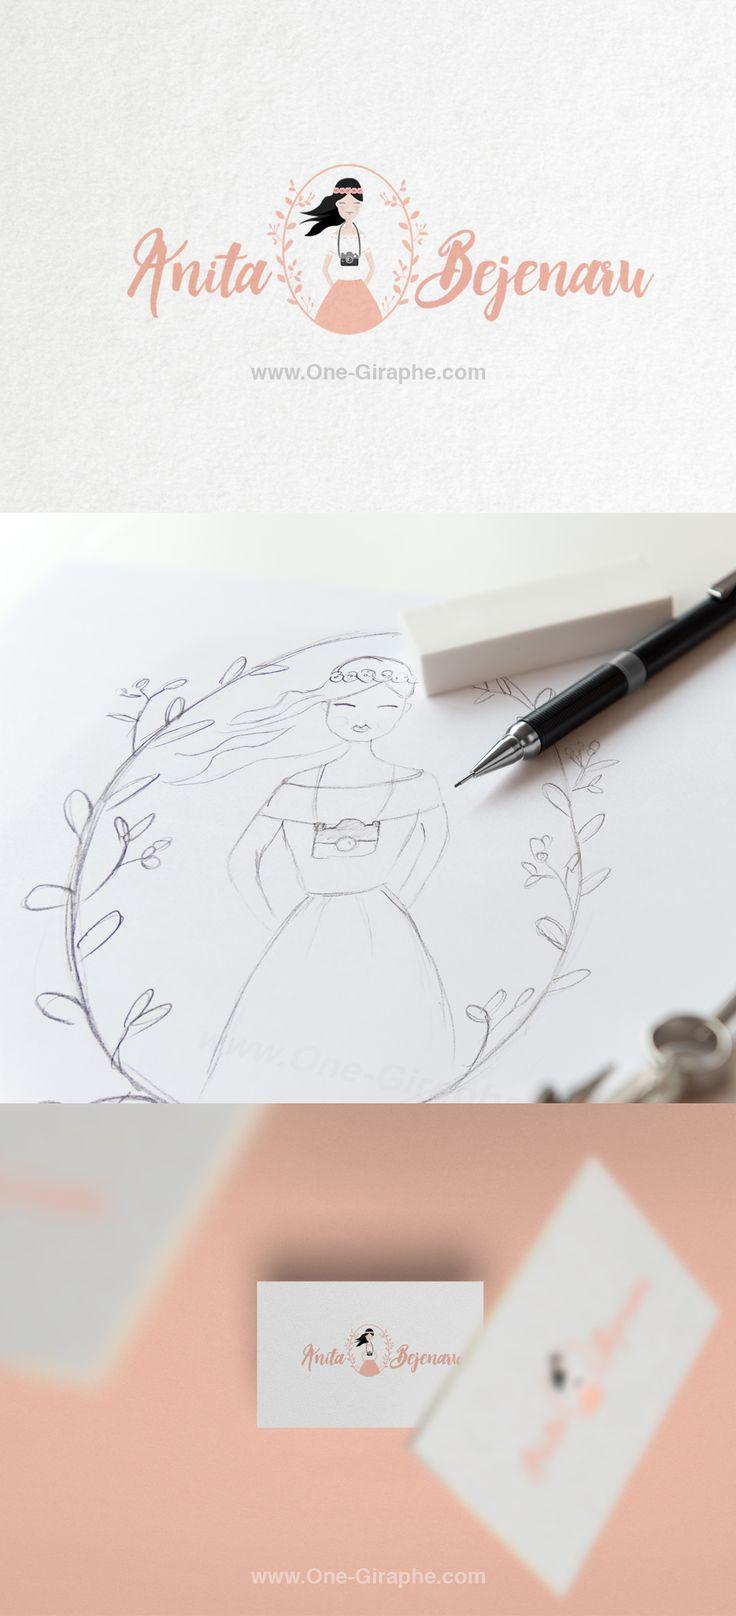 Anita Bejenaru - Photography - Brand Identity - #brandidentity #logo #photography #sweet #cute #portrait #logodesign #design #designer #onegiraphe #portfolio  http://one-giraphe.com/prev.php?c=199